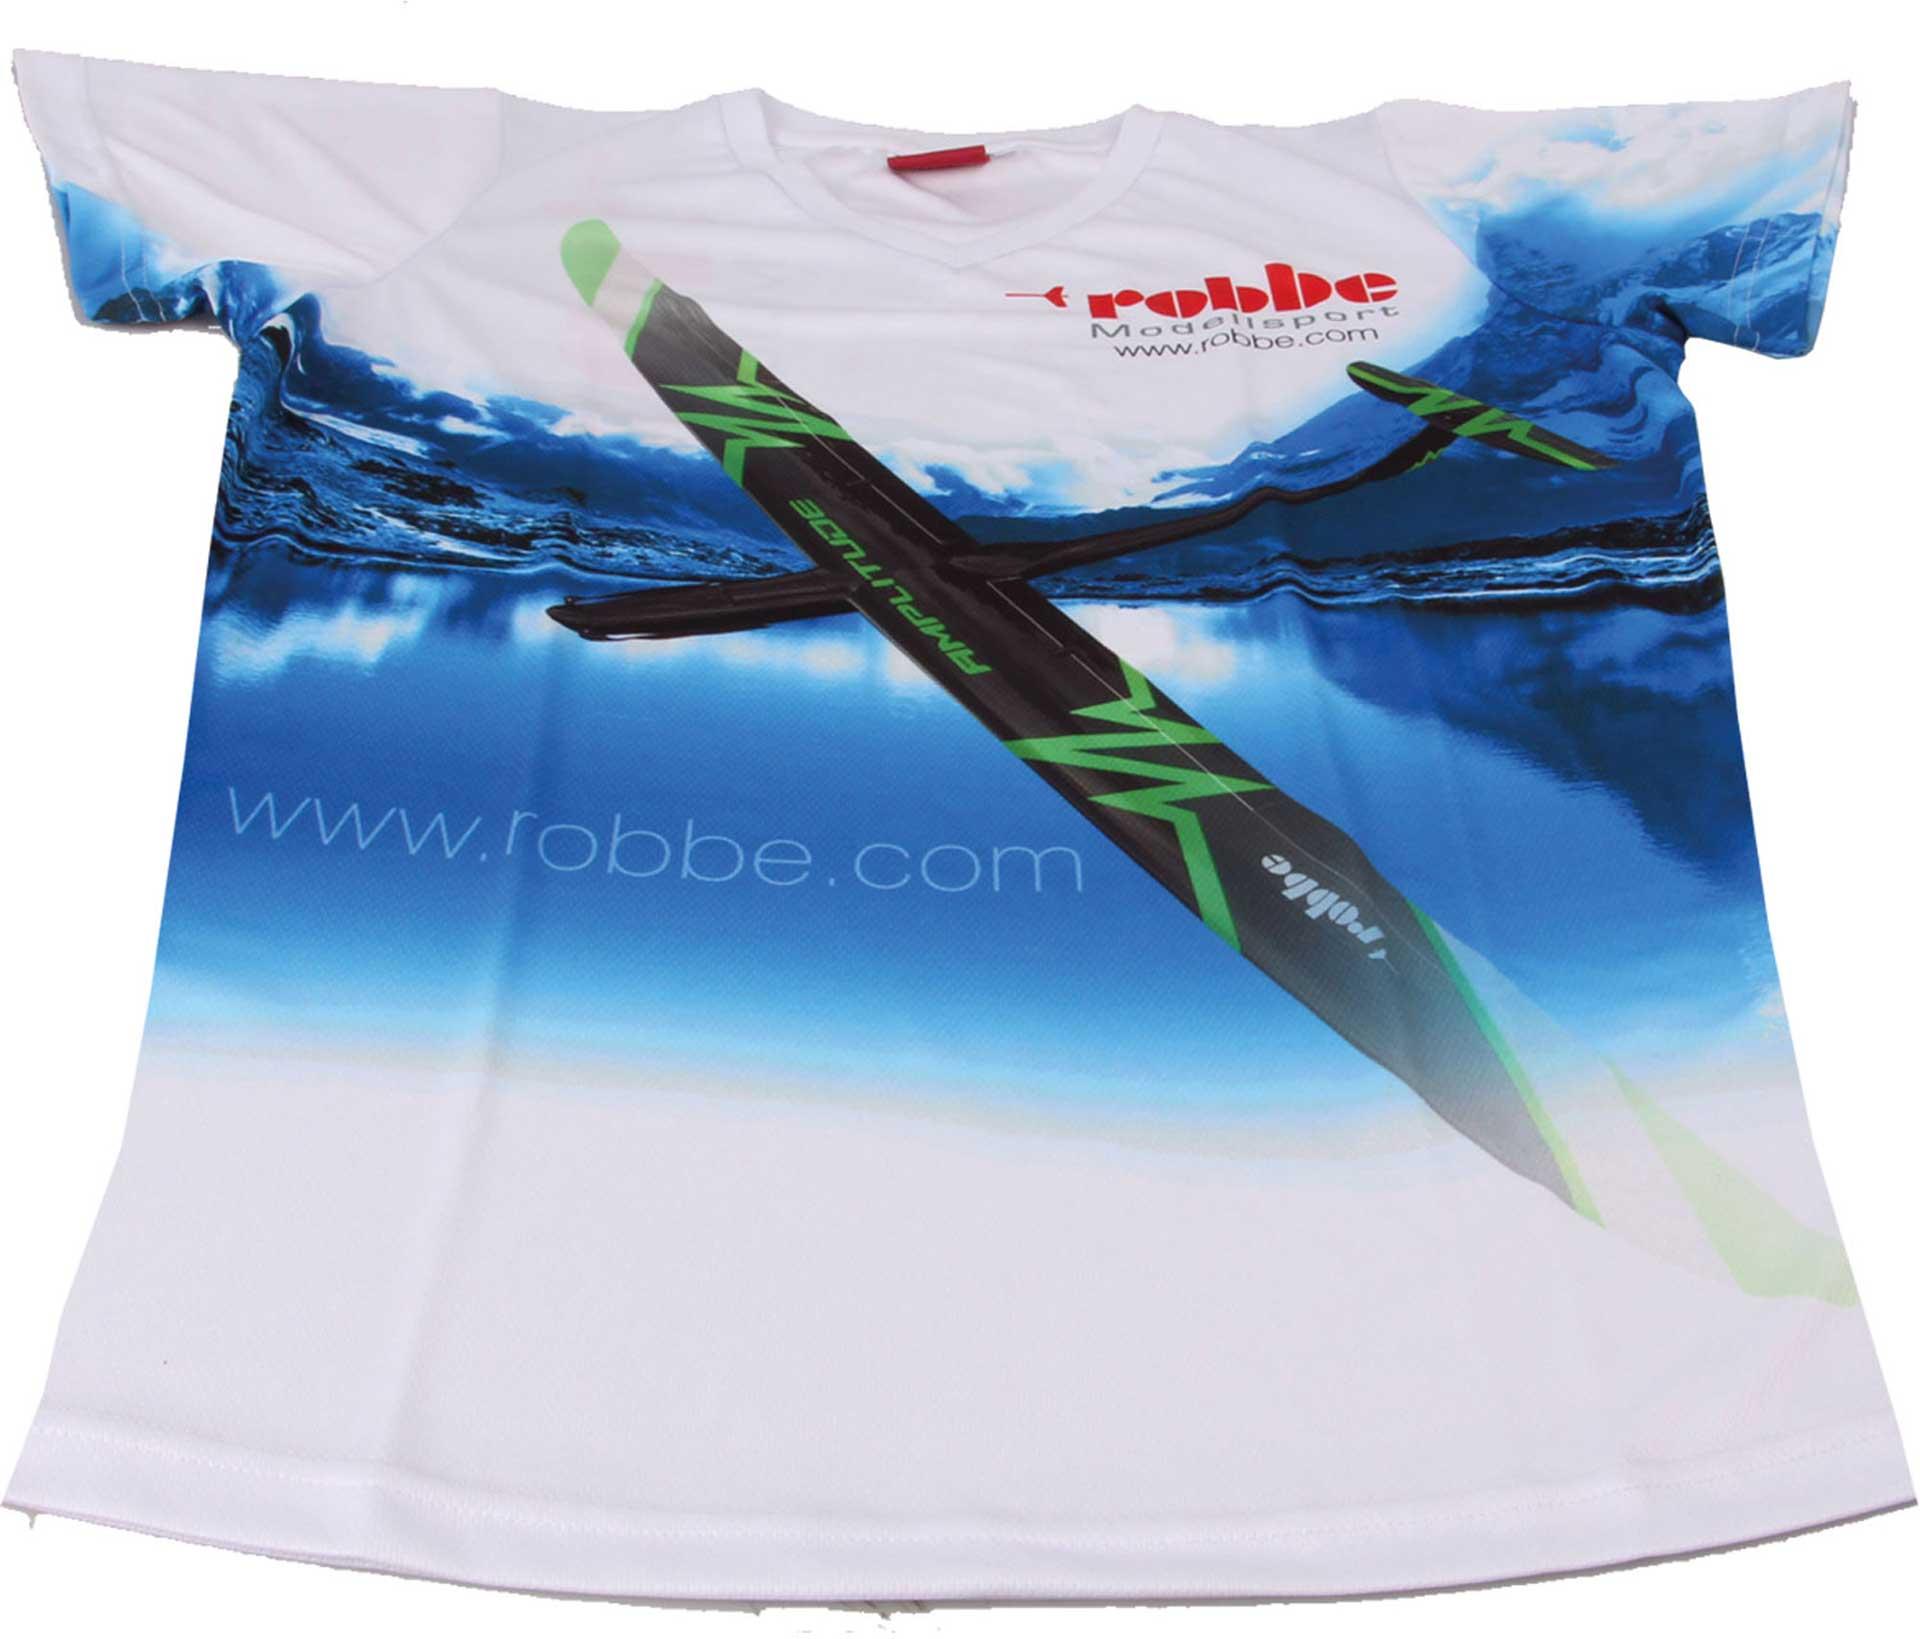 "Robbe Modellsport FUNKTIONS T-SHIRT ""AMPLITUDE"" ROBBE GRÖSSE S"